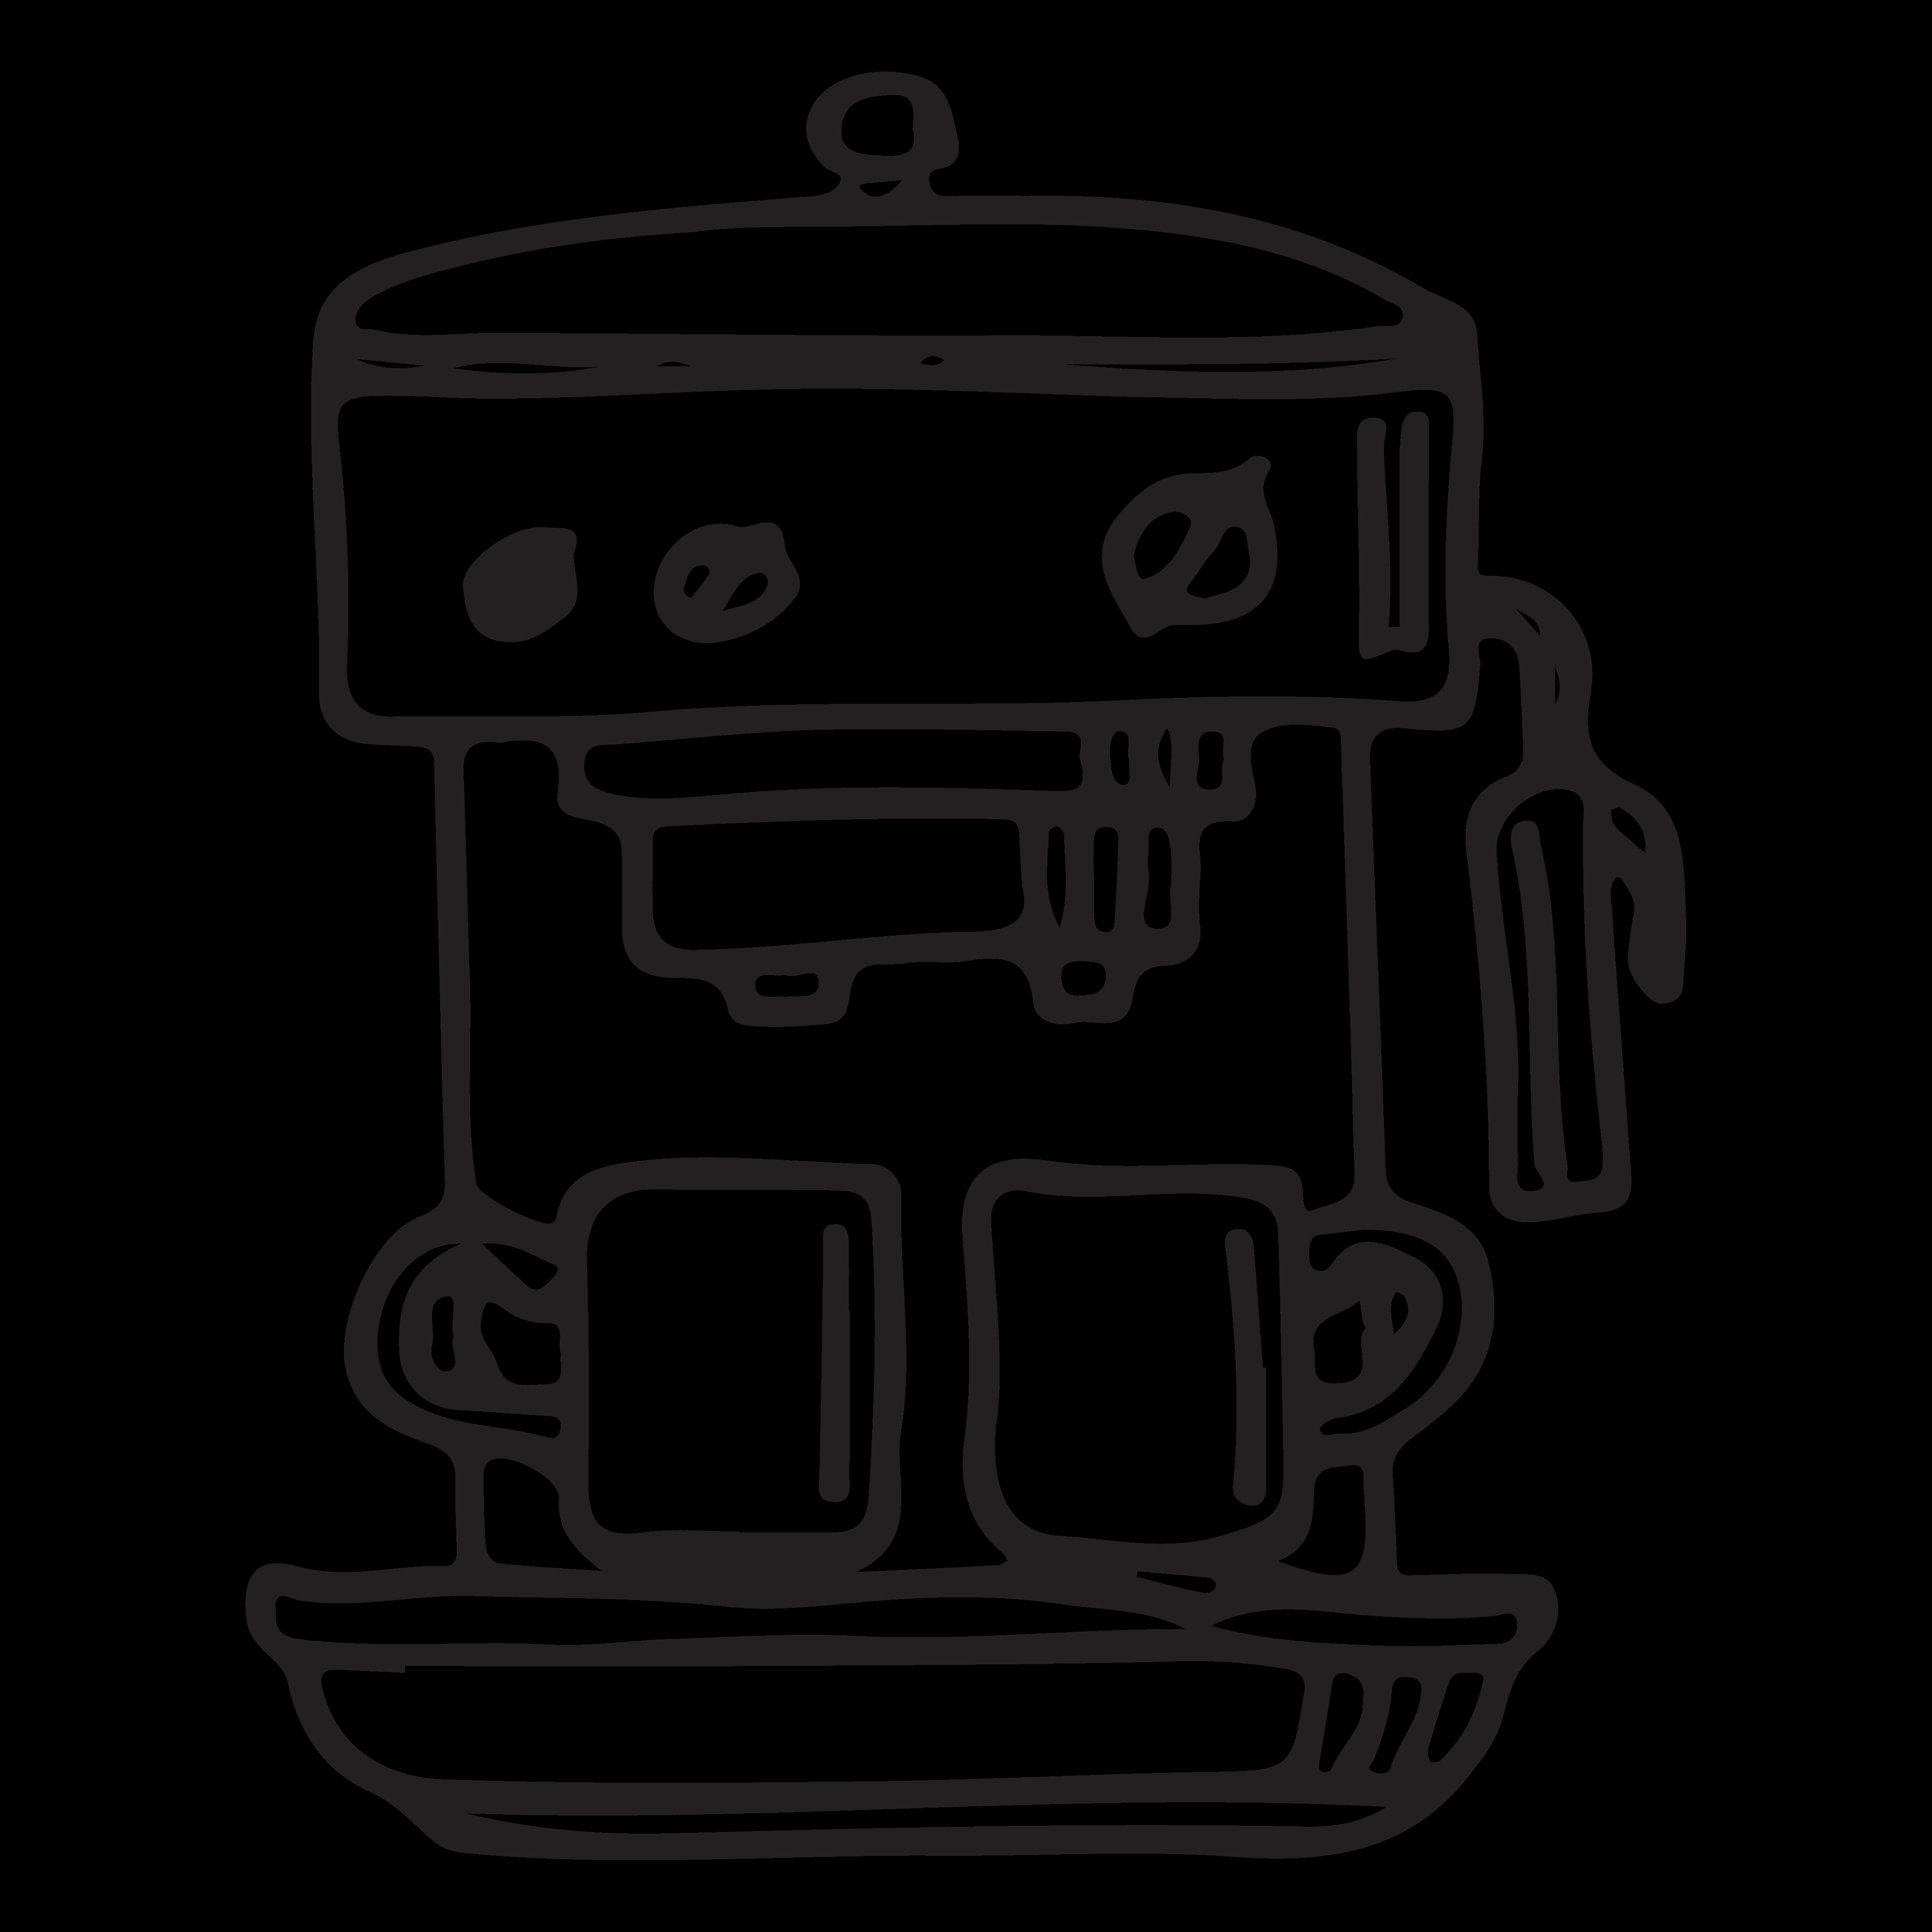 Wholesale Gustos Coffee Shop Business Partner Espresso Machines